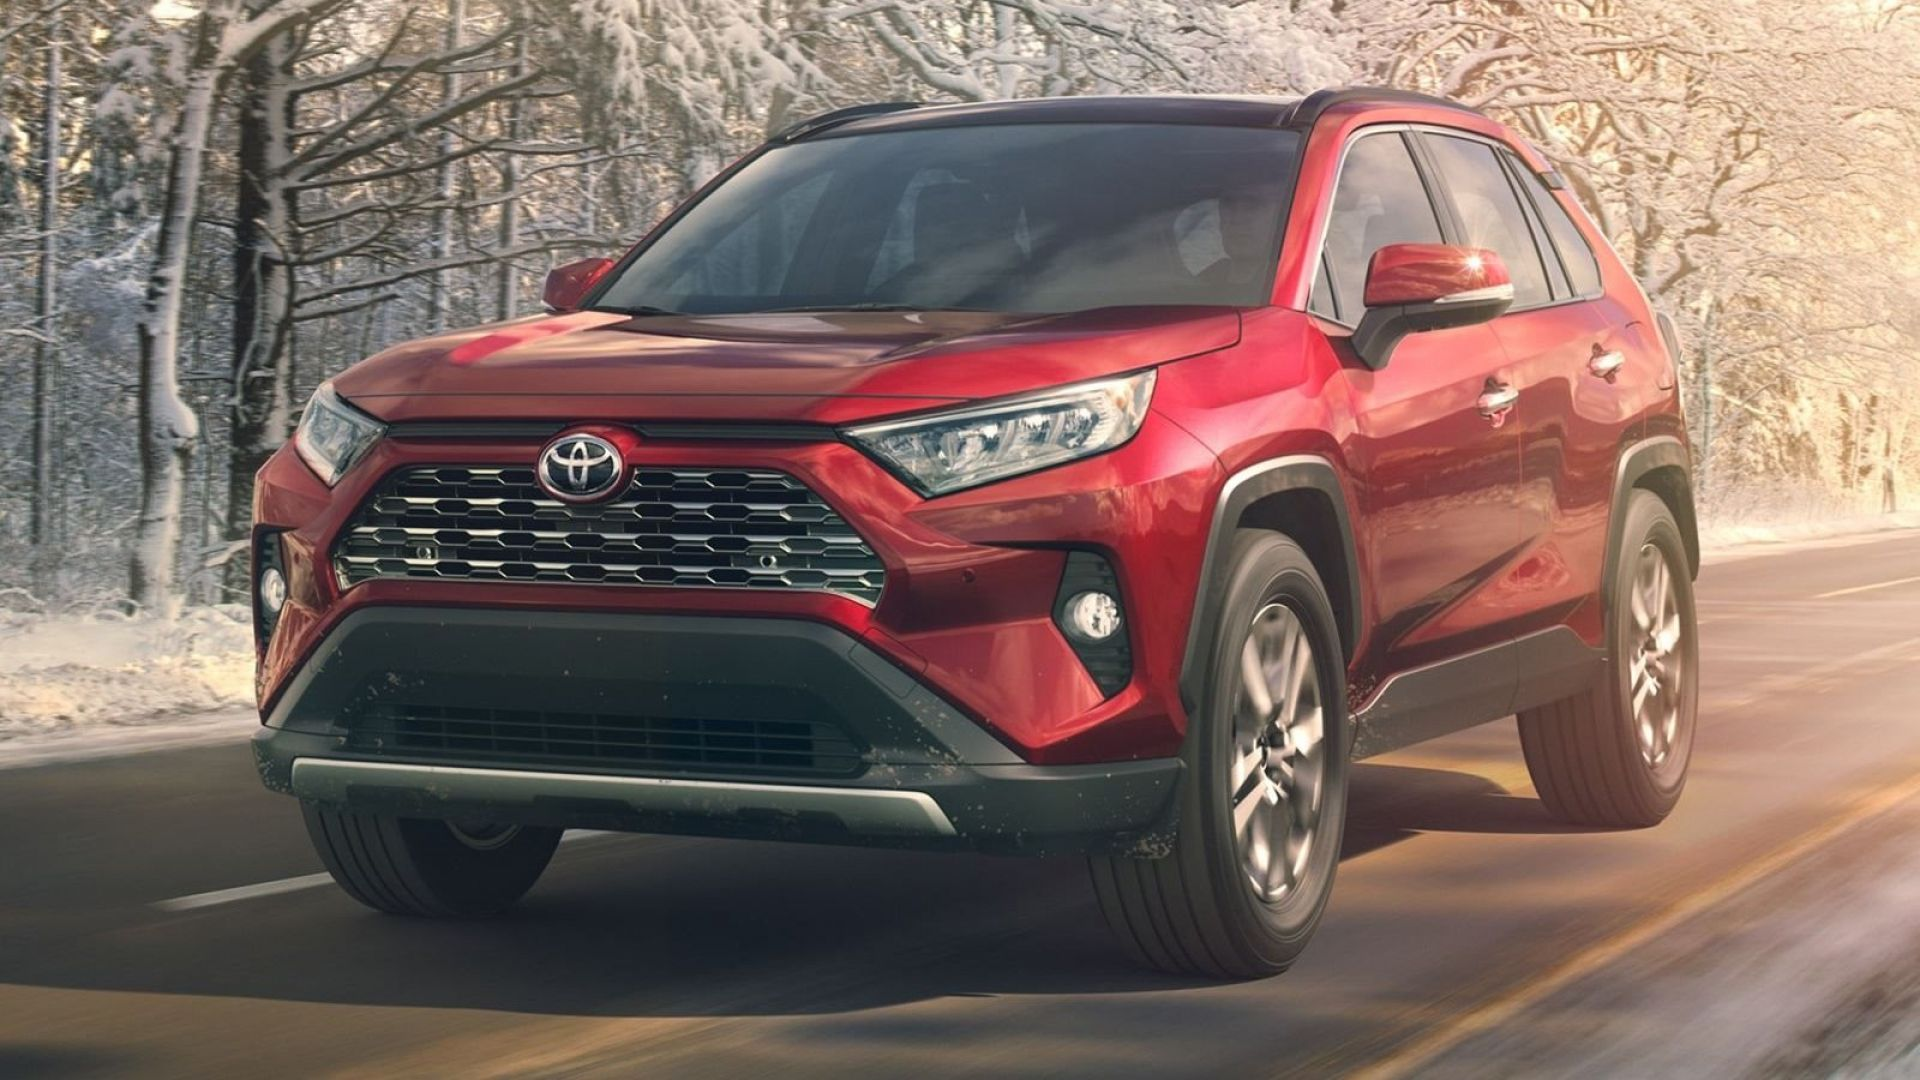 Toyota Rav4 ibrida 2019: dimensioni, scheda tecnica ...